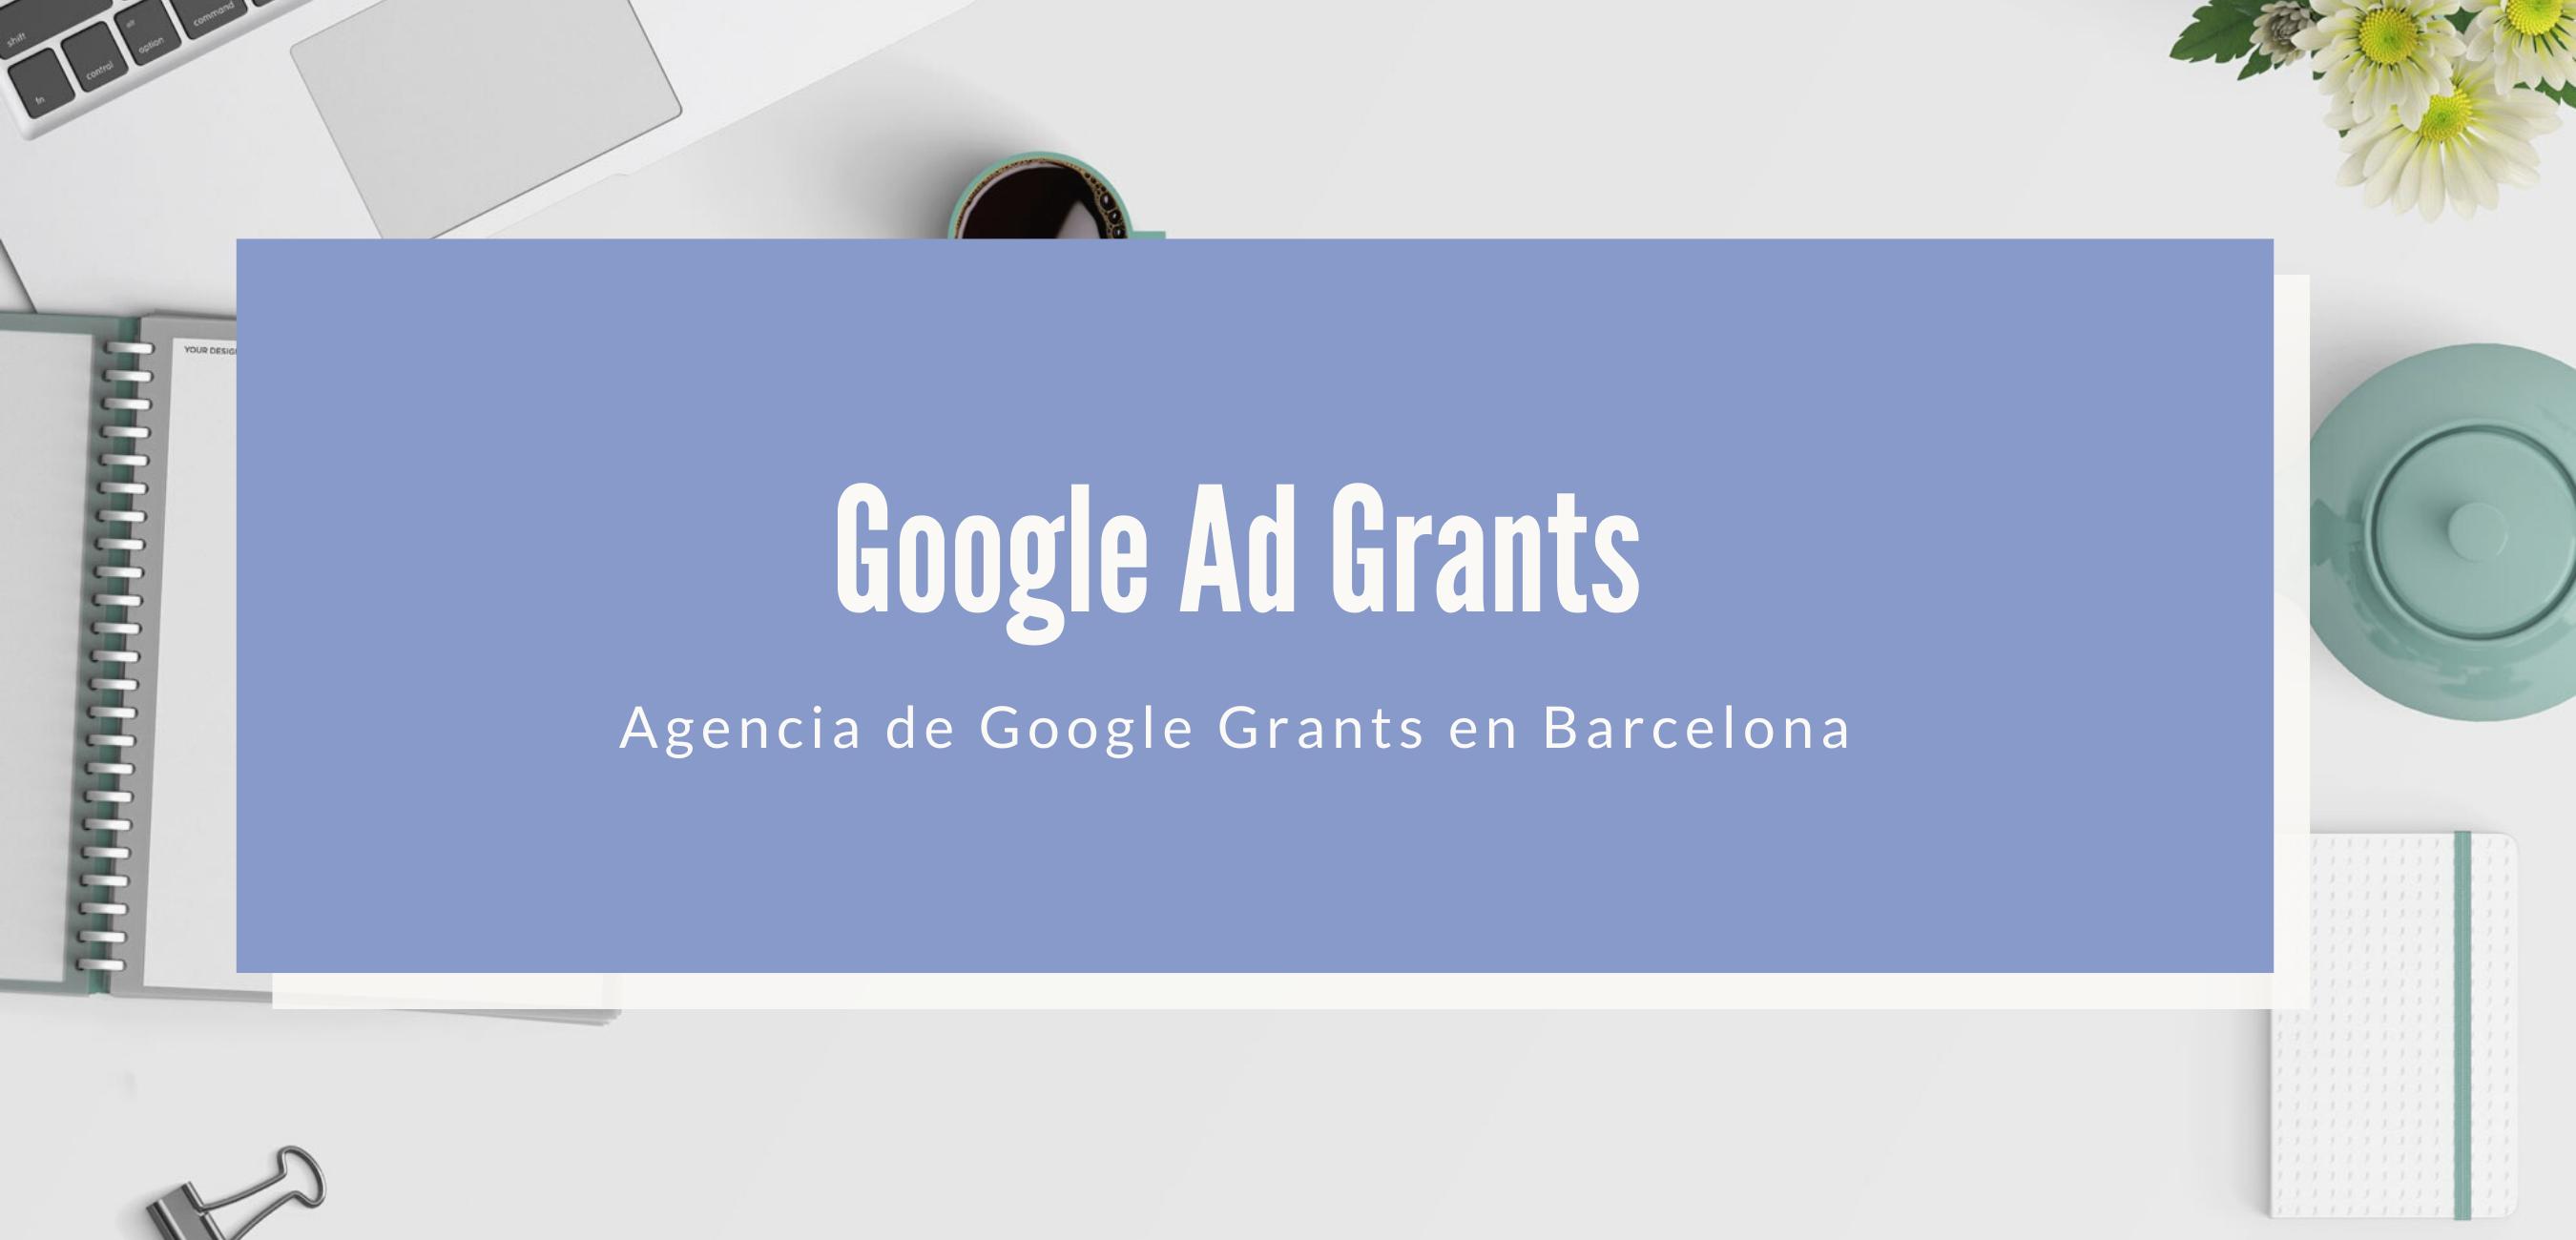 Google Grants Barcelona